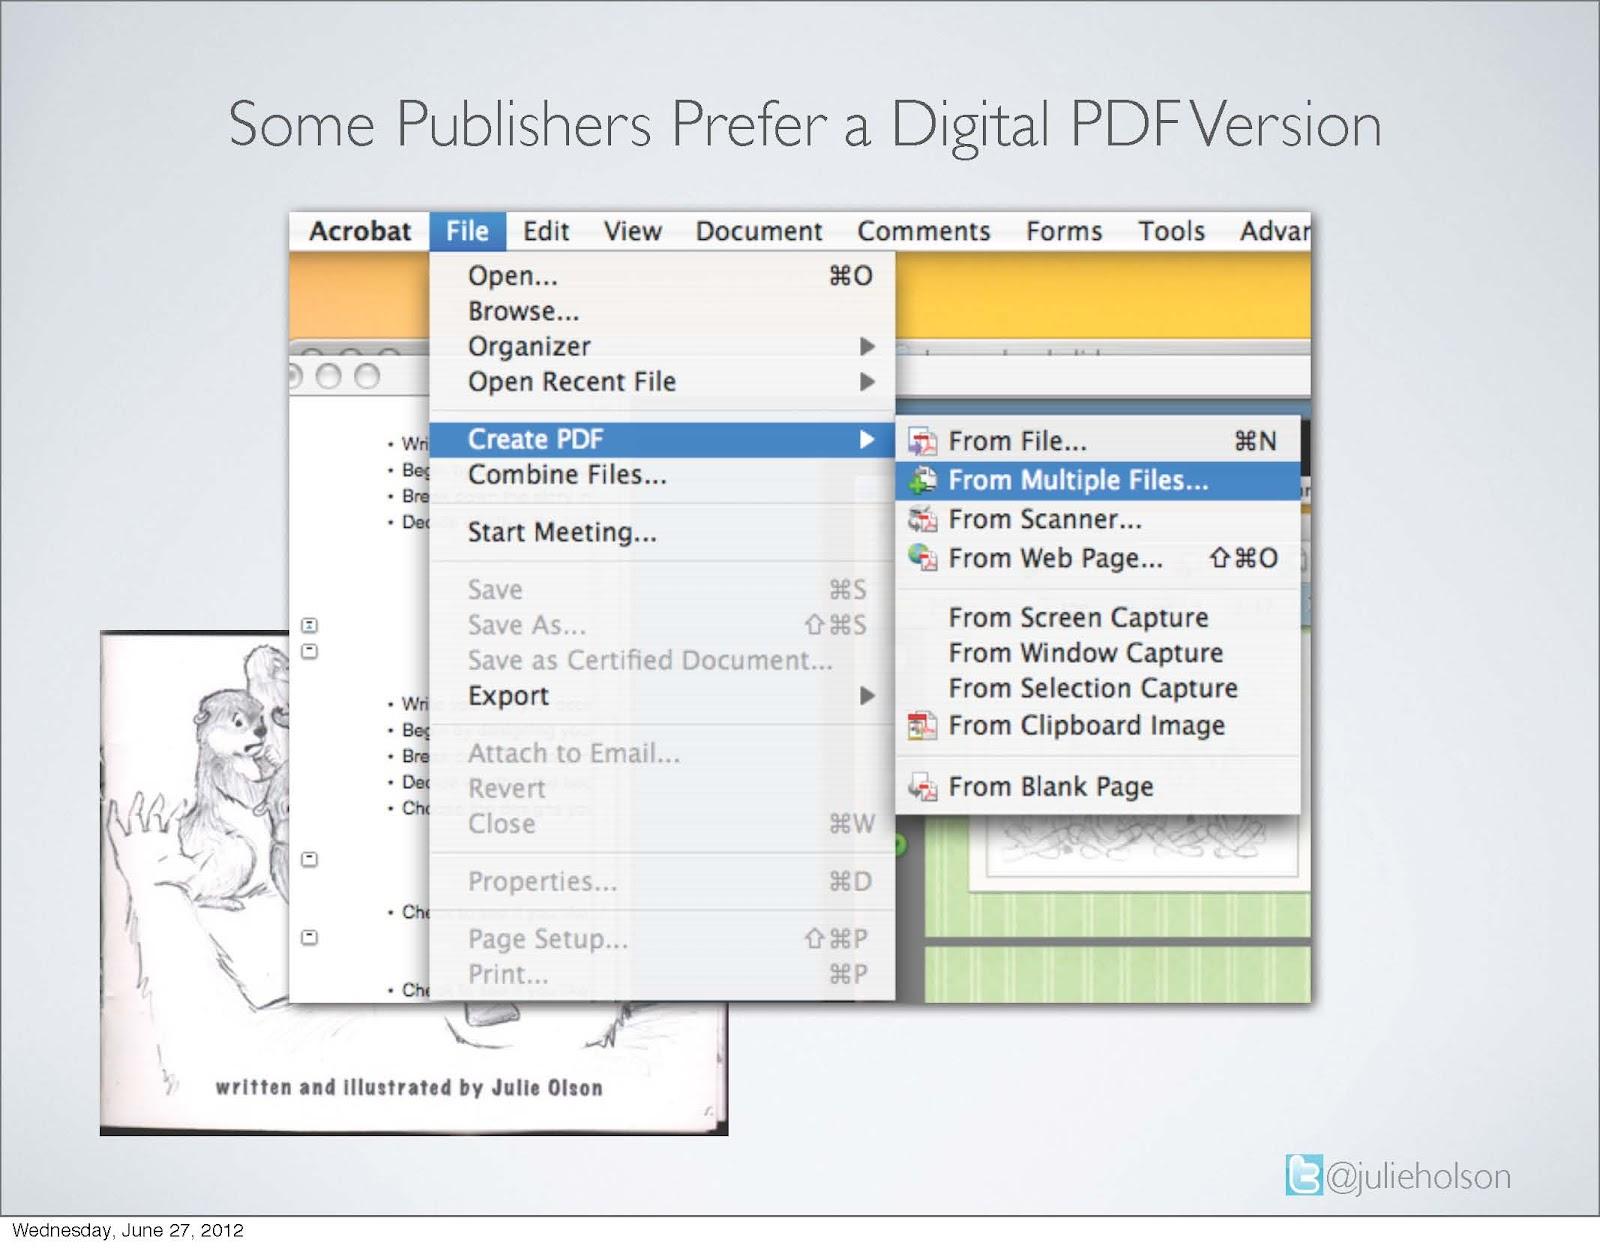 julie olson books author illustrator how to create a digital pdf